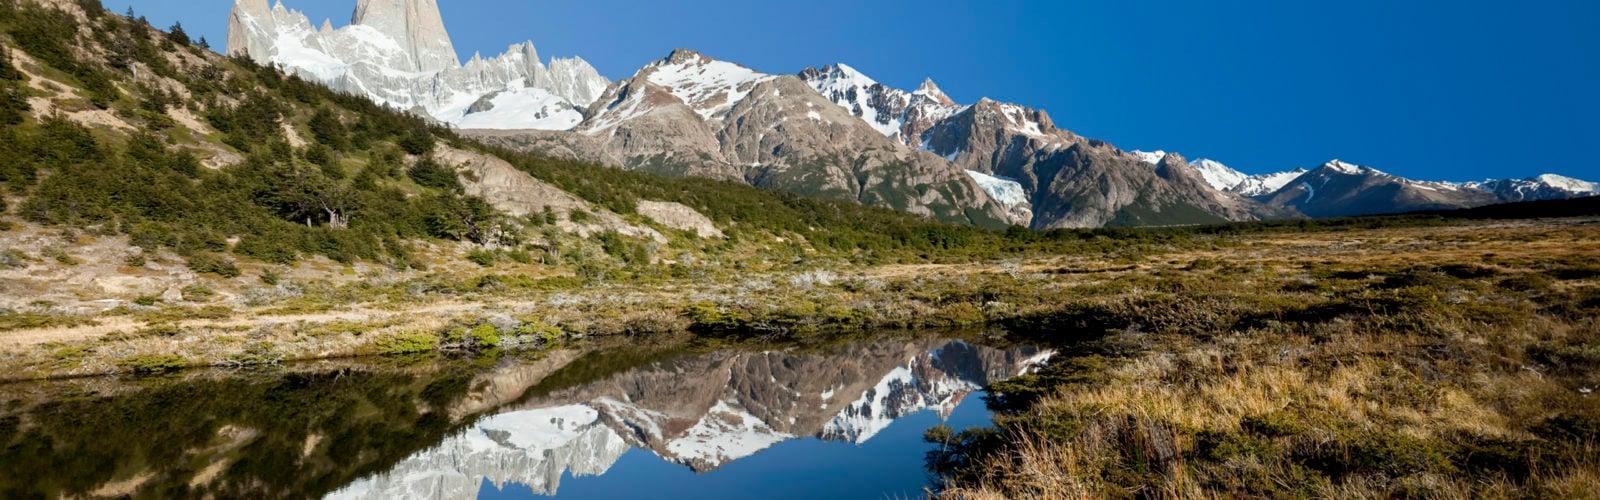 patagonia-mt-fitzroy